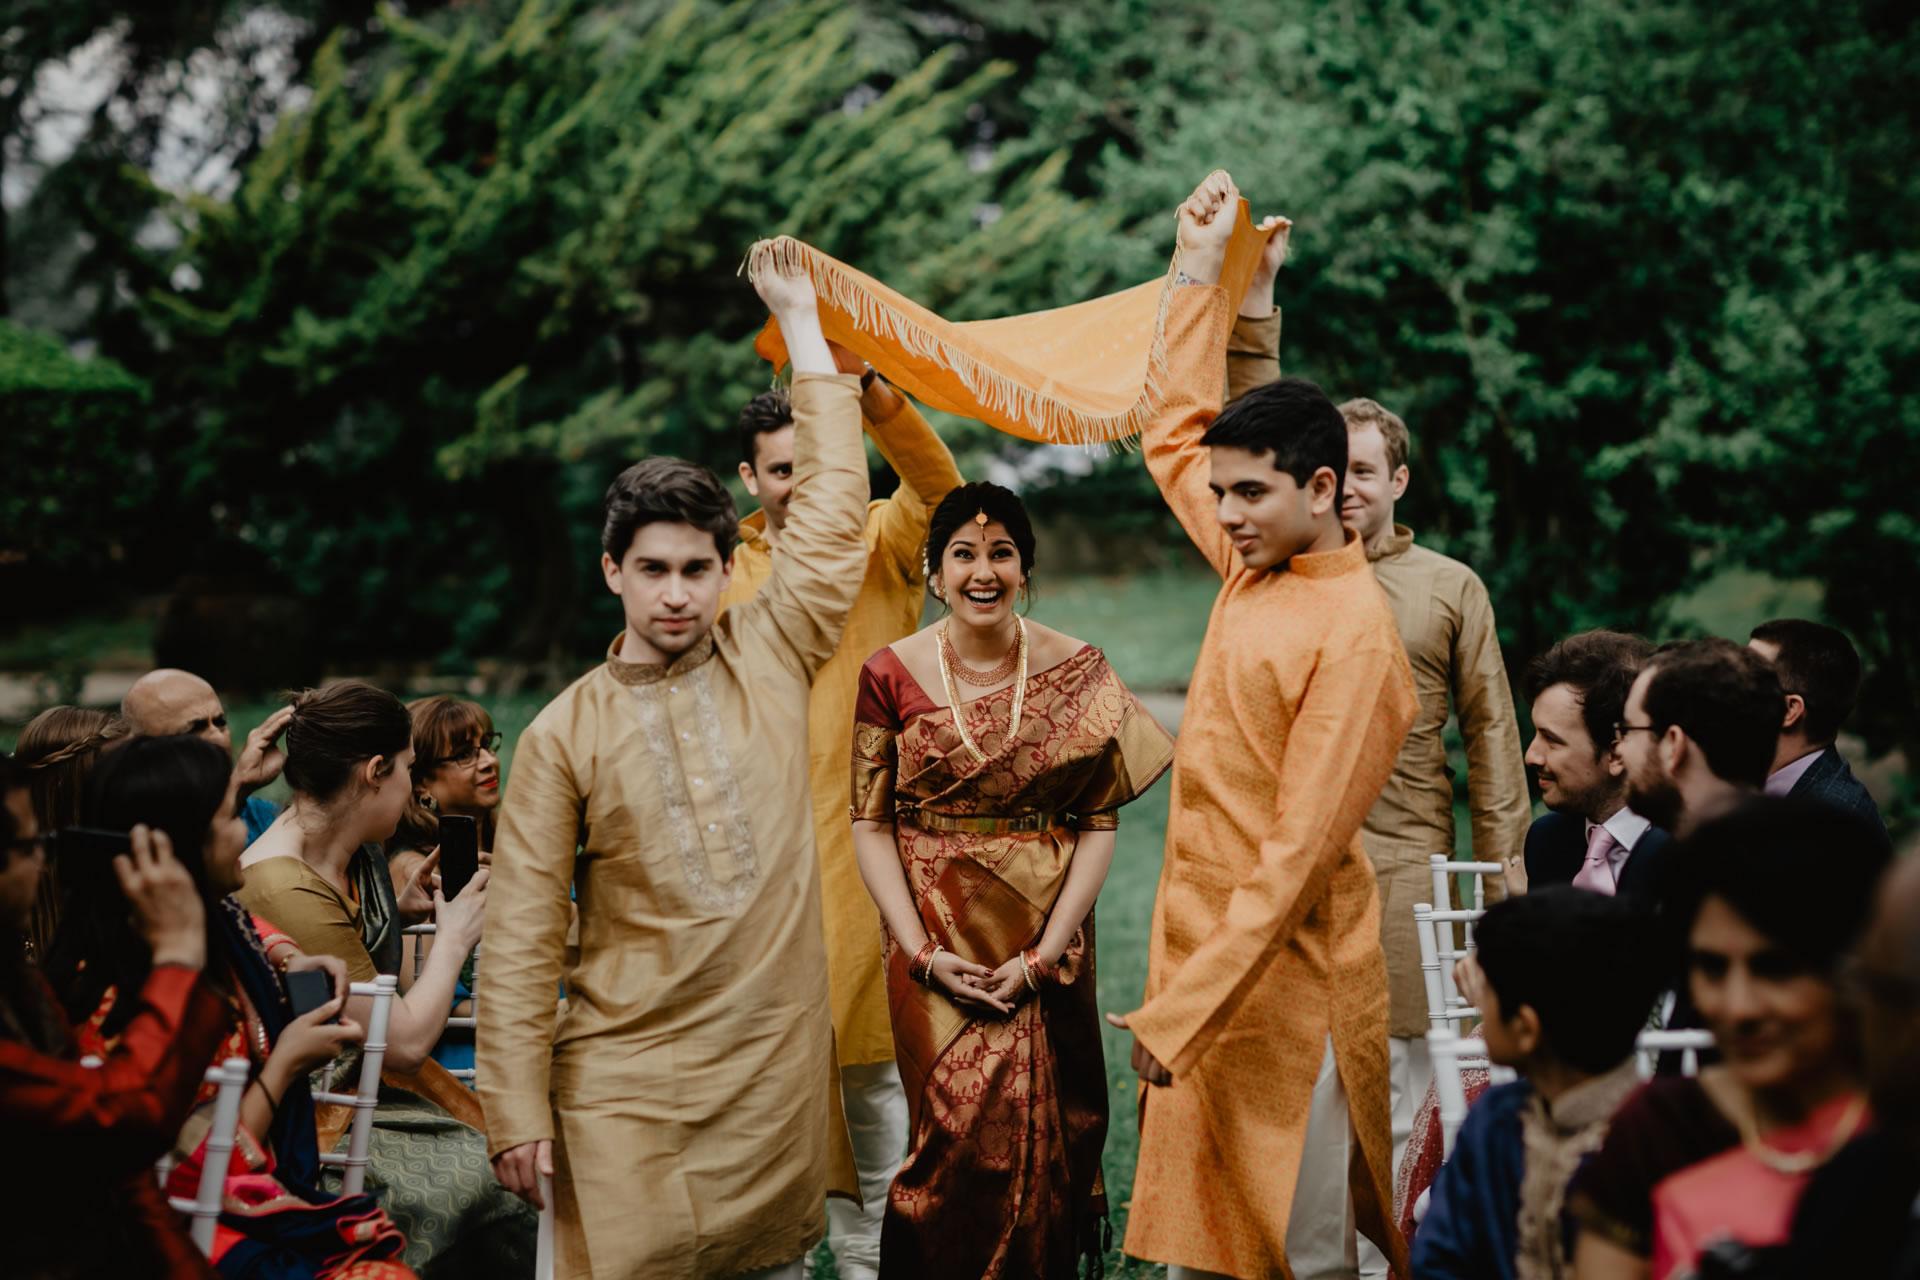 - 18 :: Indian wedding ceremony at Villa Pitiana :: Luxury wedding photography - 17 ::  - 18